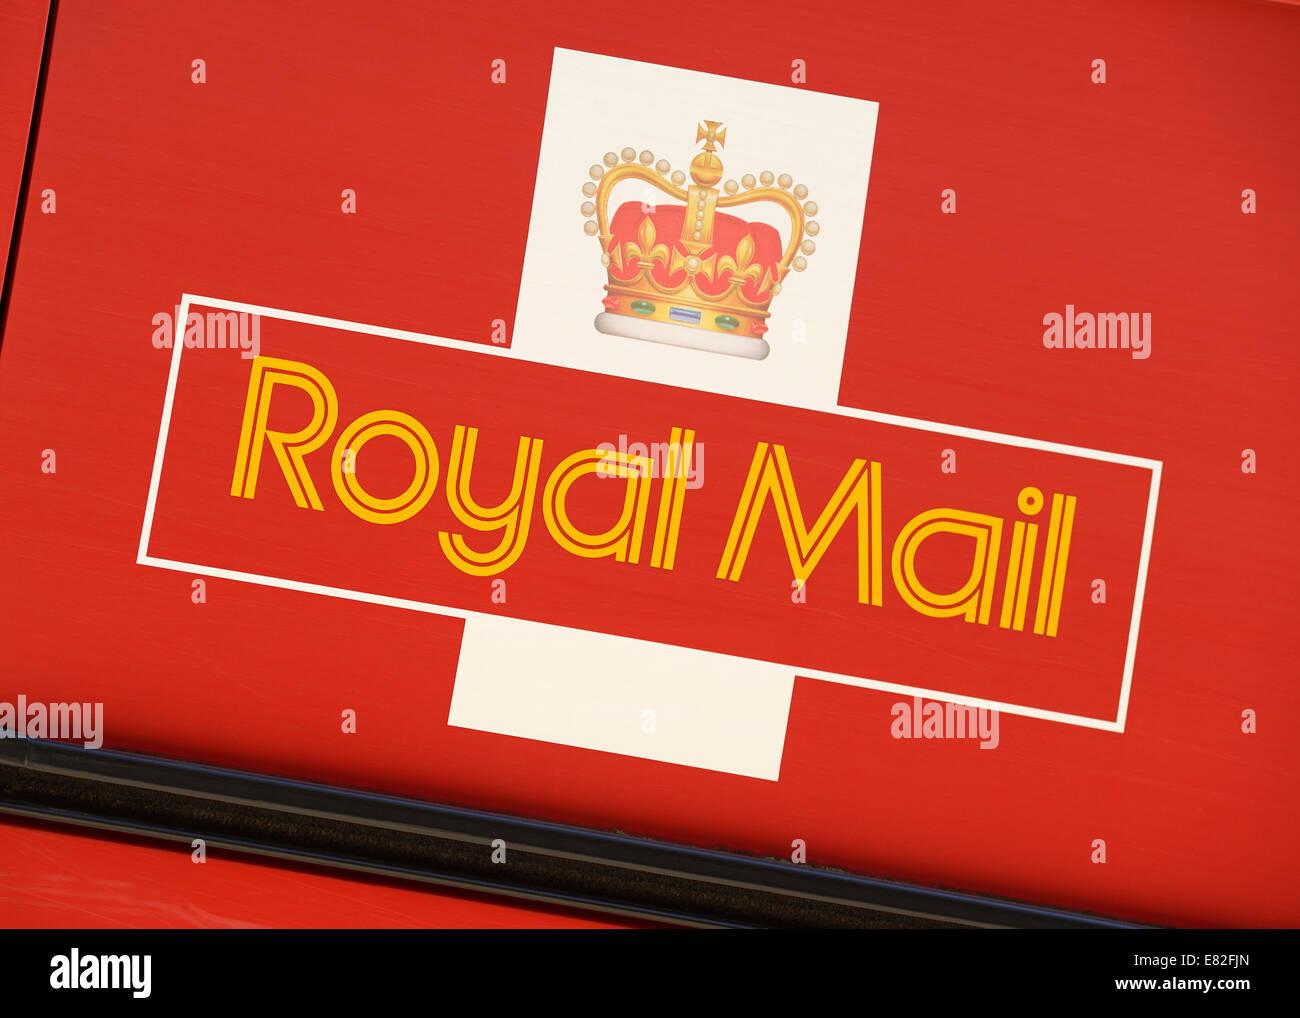 Royal Mail Logo on the Side of a Postal Van. UK. - Stock Image